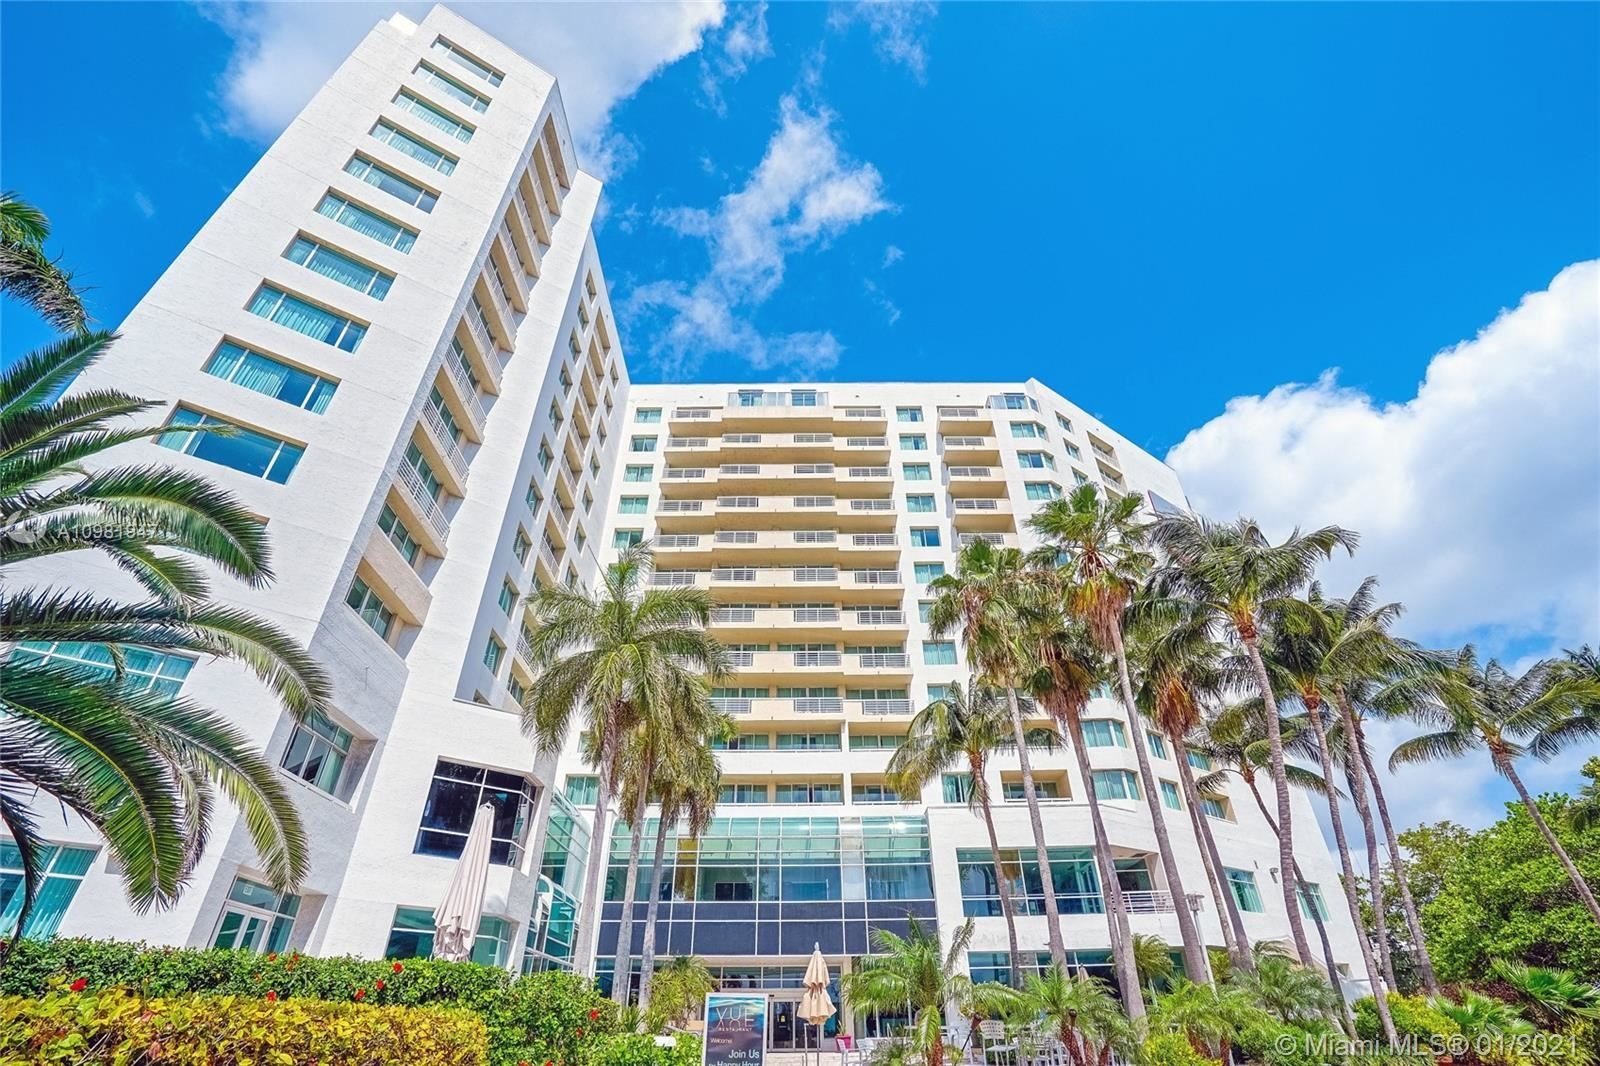 2670 E Sunrise Blvd #517, Fort Lauderdale, FL 33304 - #: A10981947